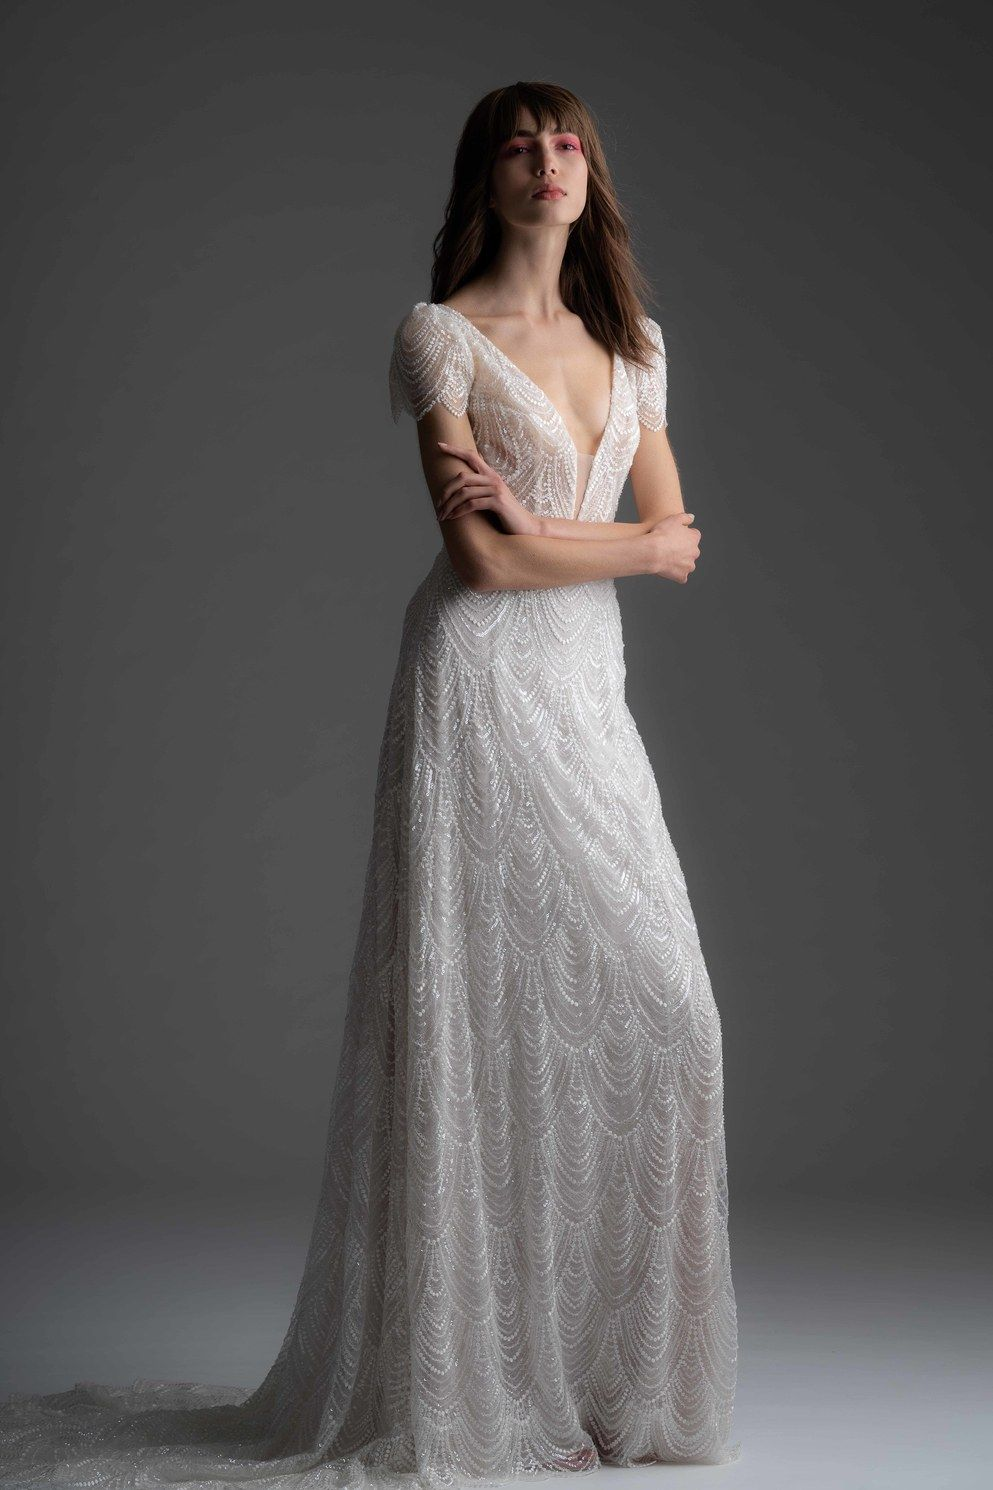 Pin By Chelsea Nicole On Wedding Dresses Sheath Wedding Dress Wedding Dresses Kleinfeld Wedding Dresses [ 1490 x 993 Pixel ]